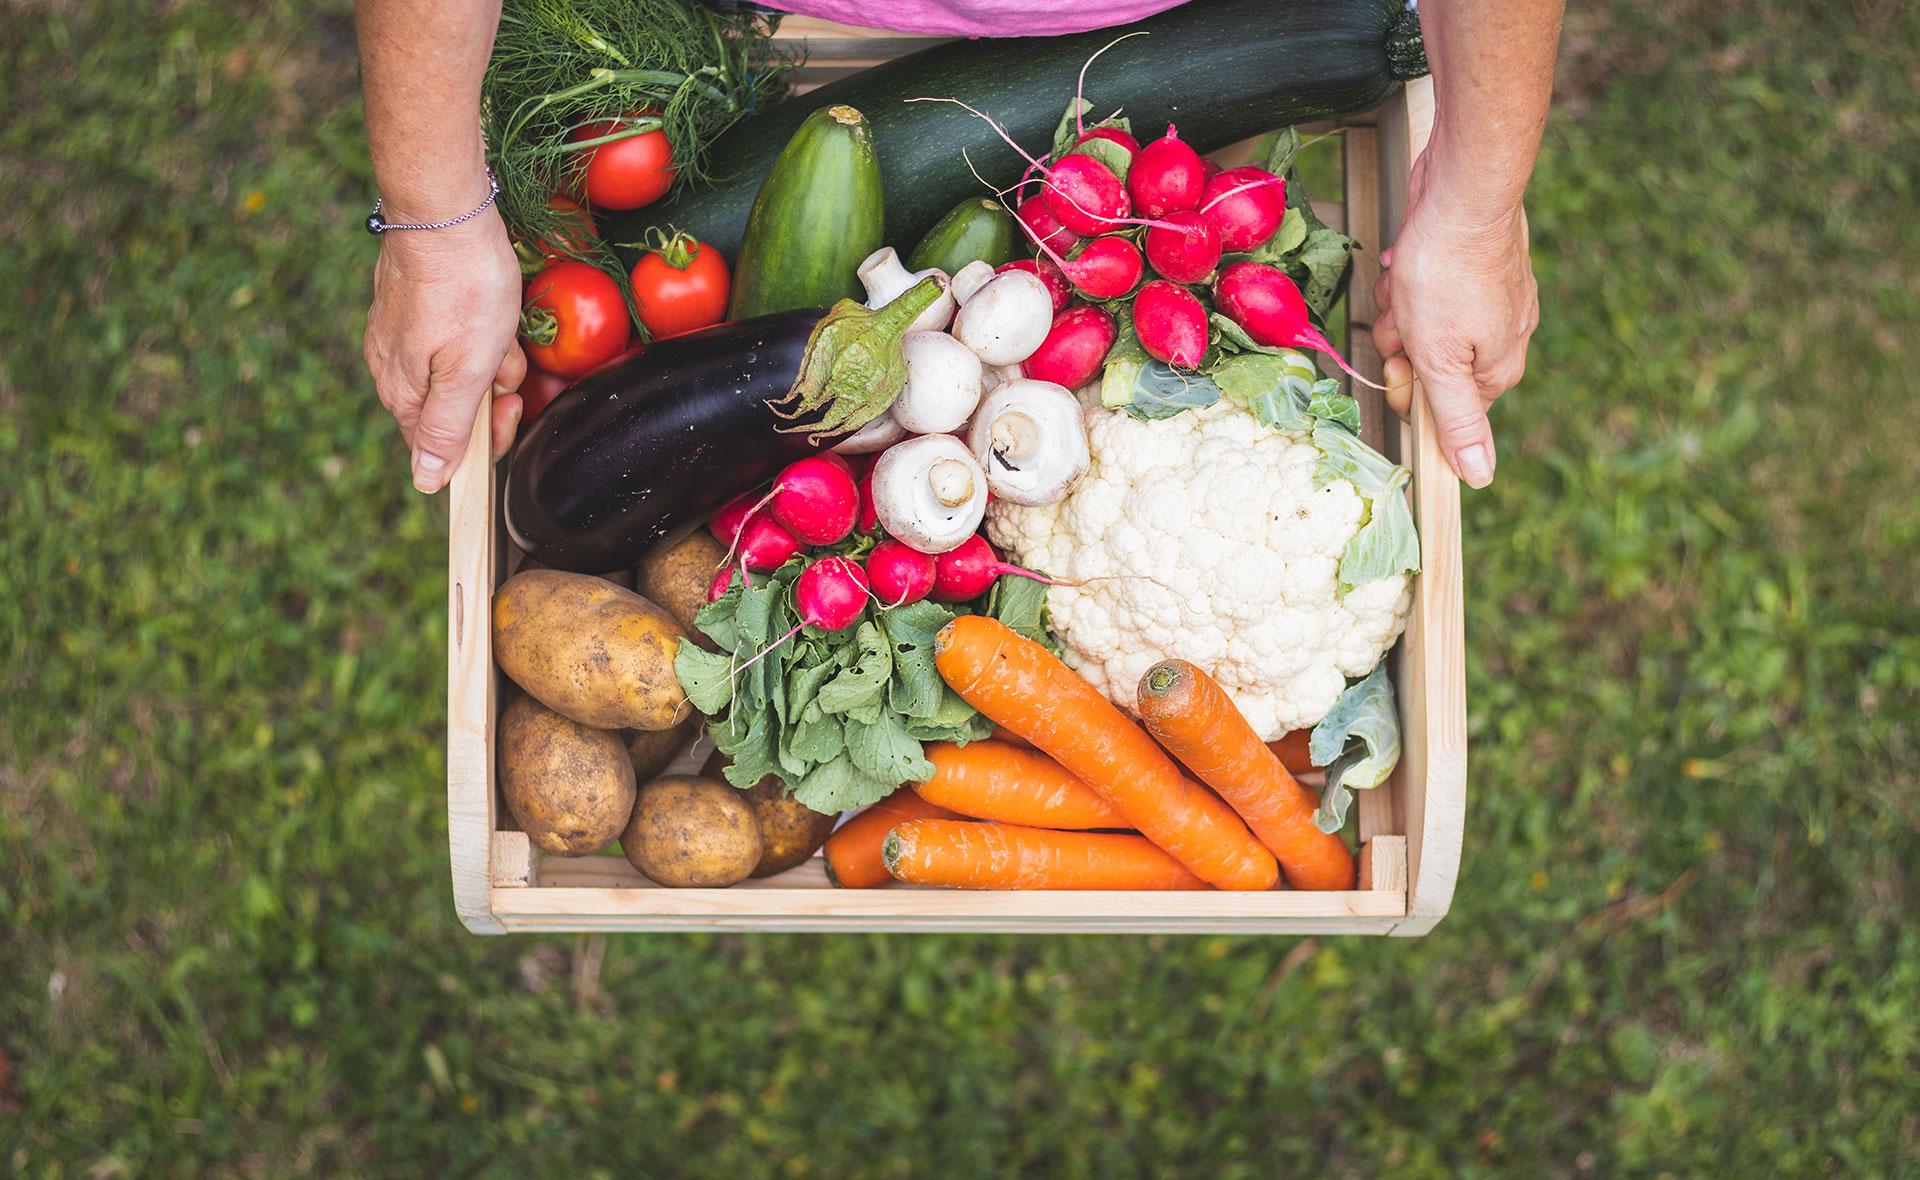 BBVA-comida-proximidad-apertura-alimentos-sostenibles-renovables-productos